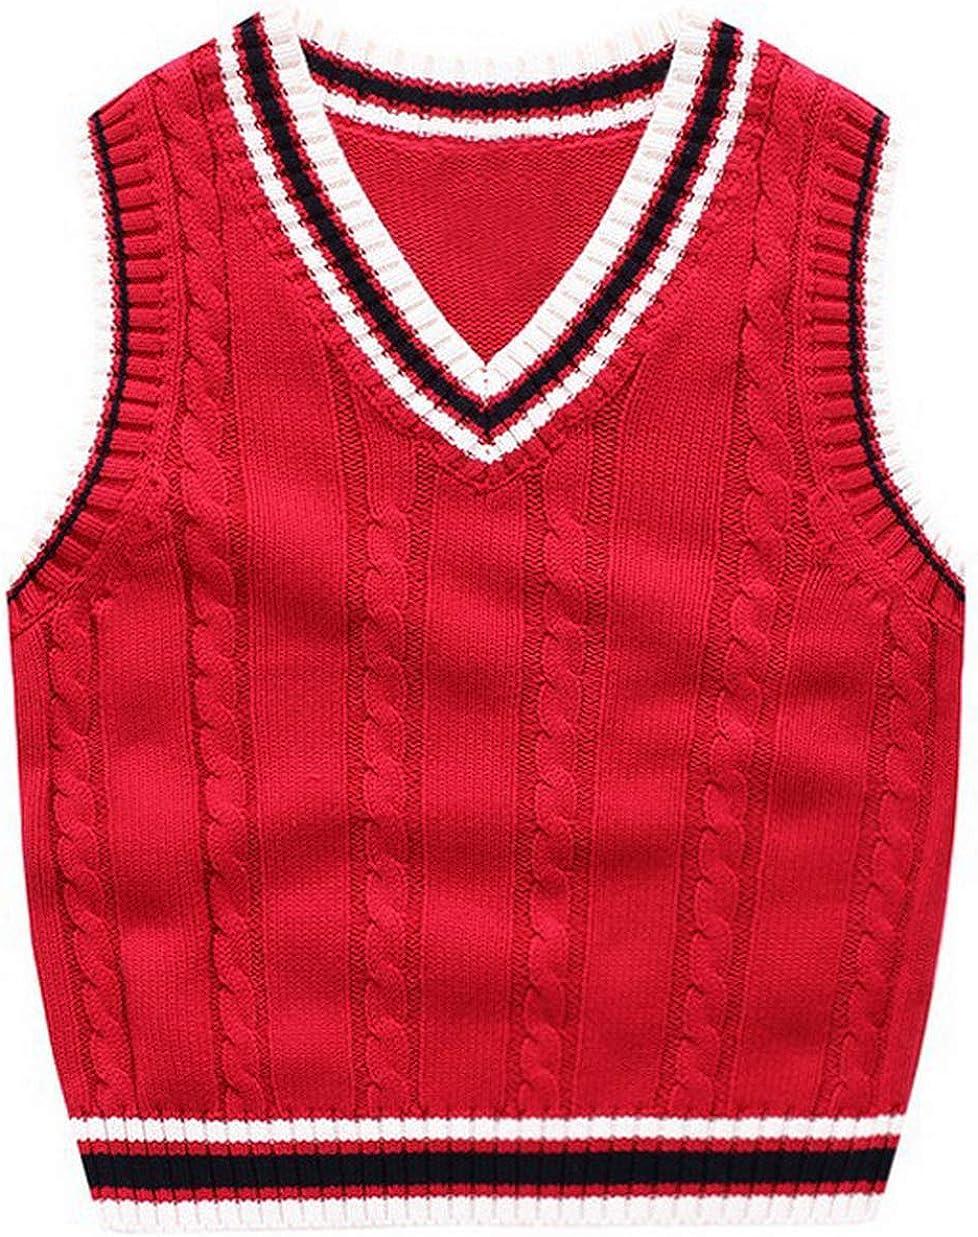 GEMVIE Kids Boys Girls V Neck Vest Knit Tops Solid Color Casual Pullover Sleeveless Sweater School Uniform Knit Waistcoat